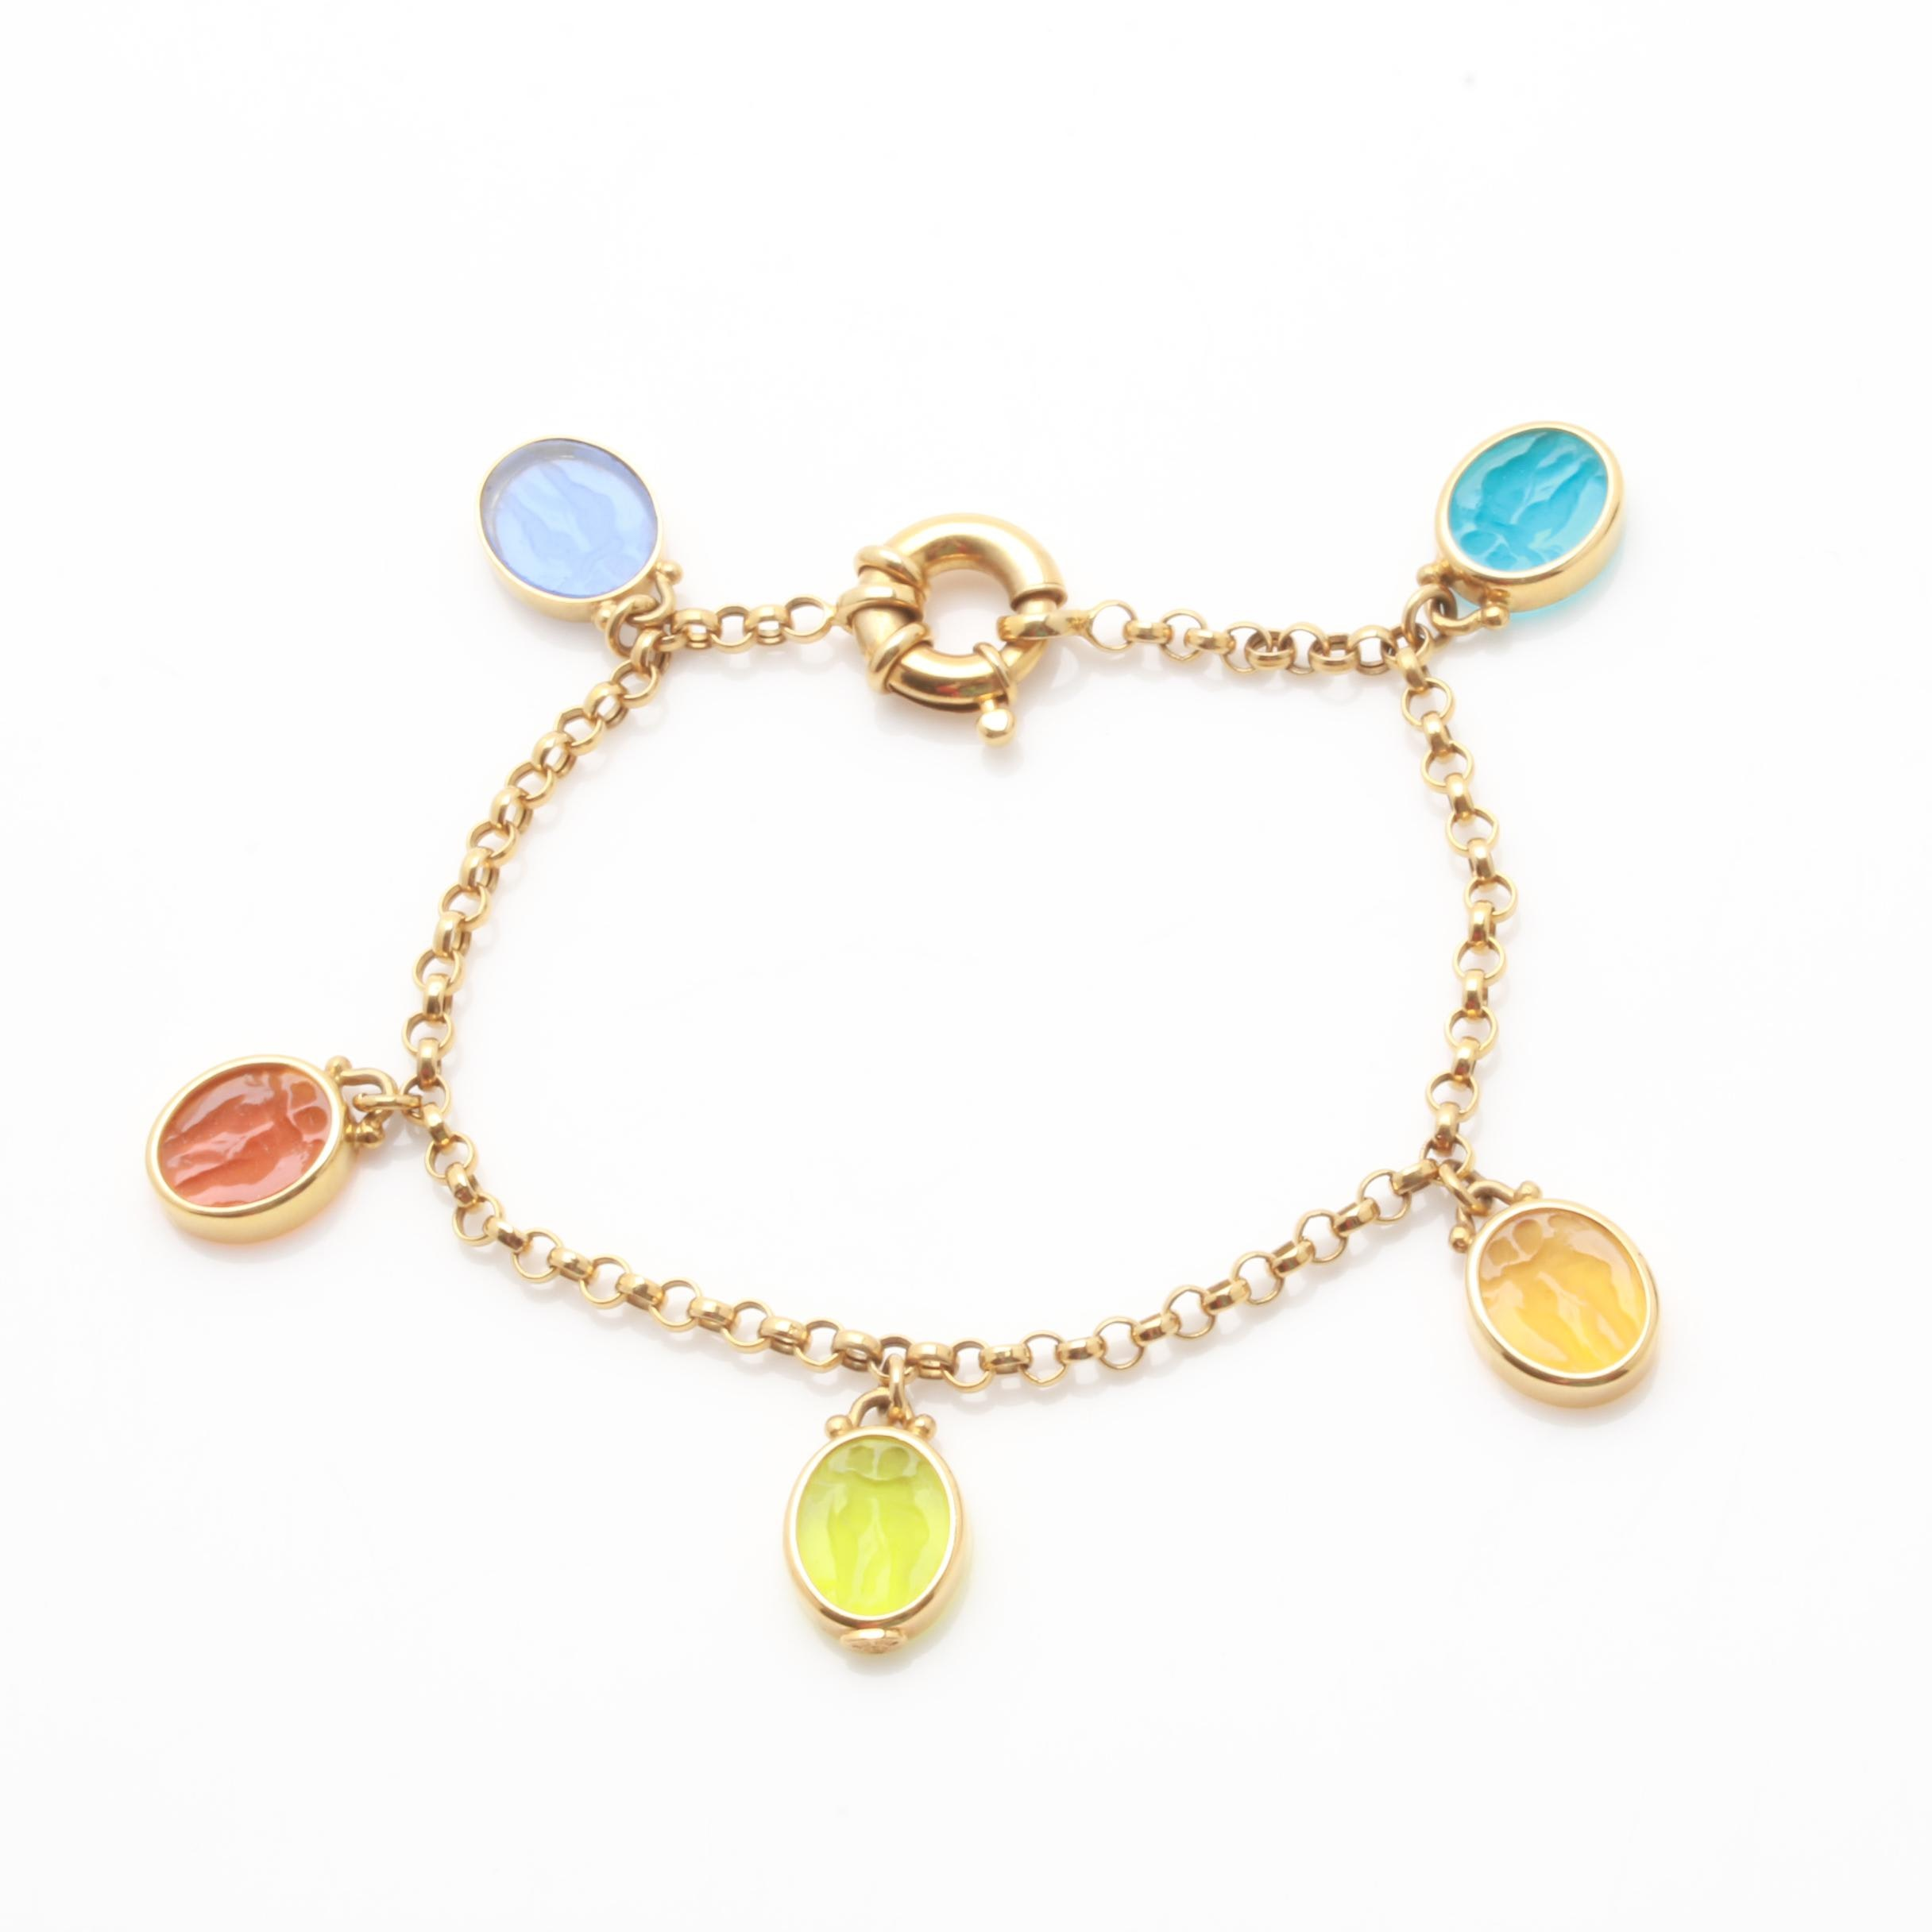 14K Yellow Gold Multi Colored Intaglio Glass Charm Link Bracelet